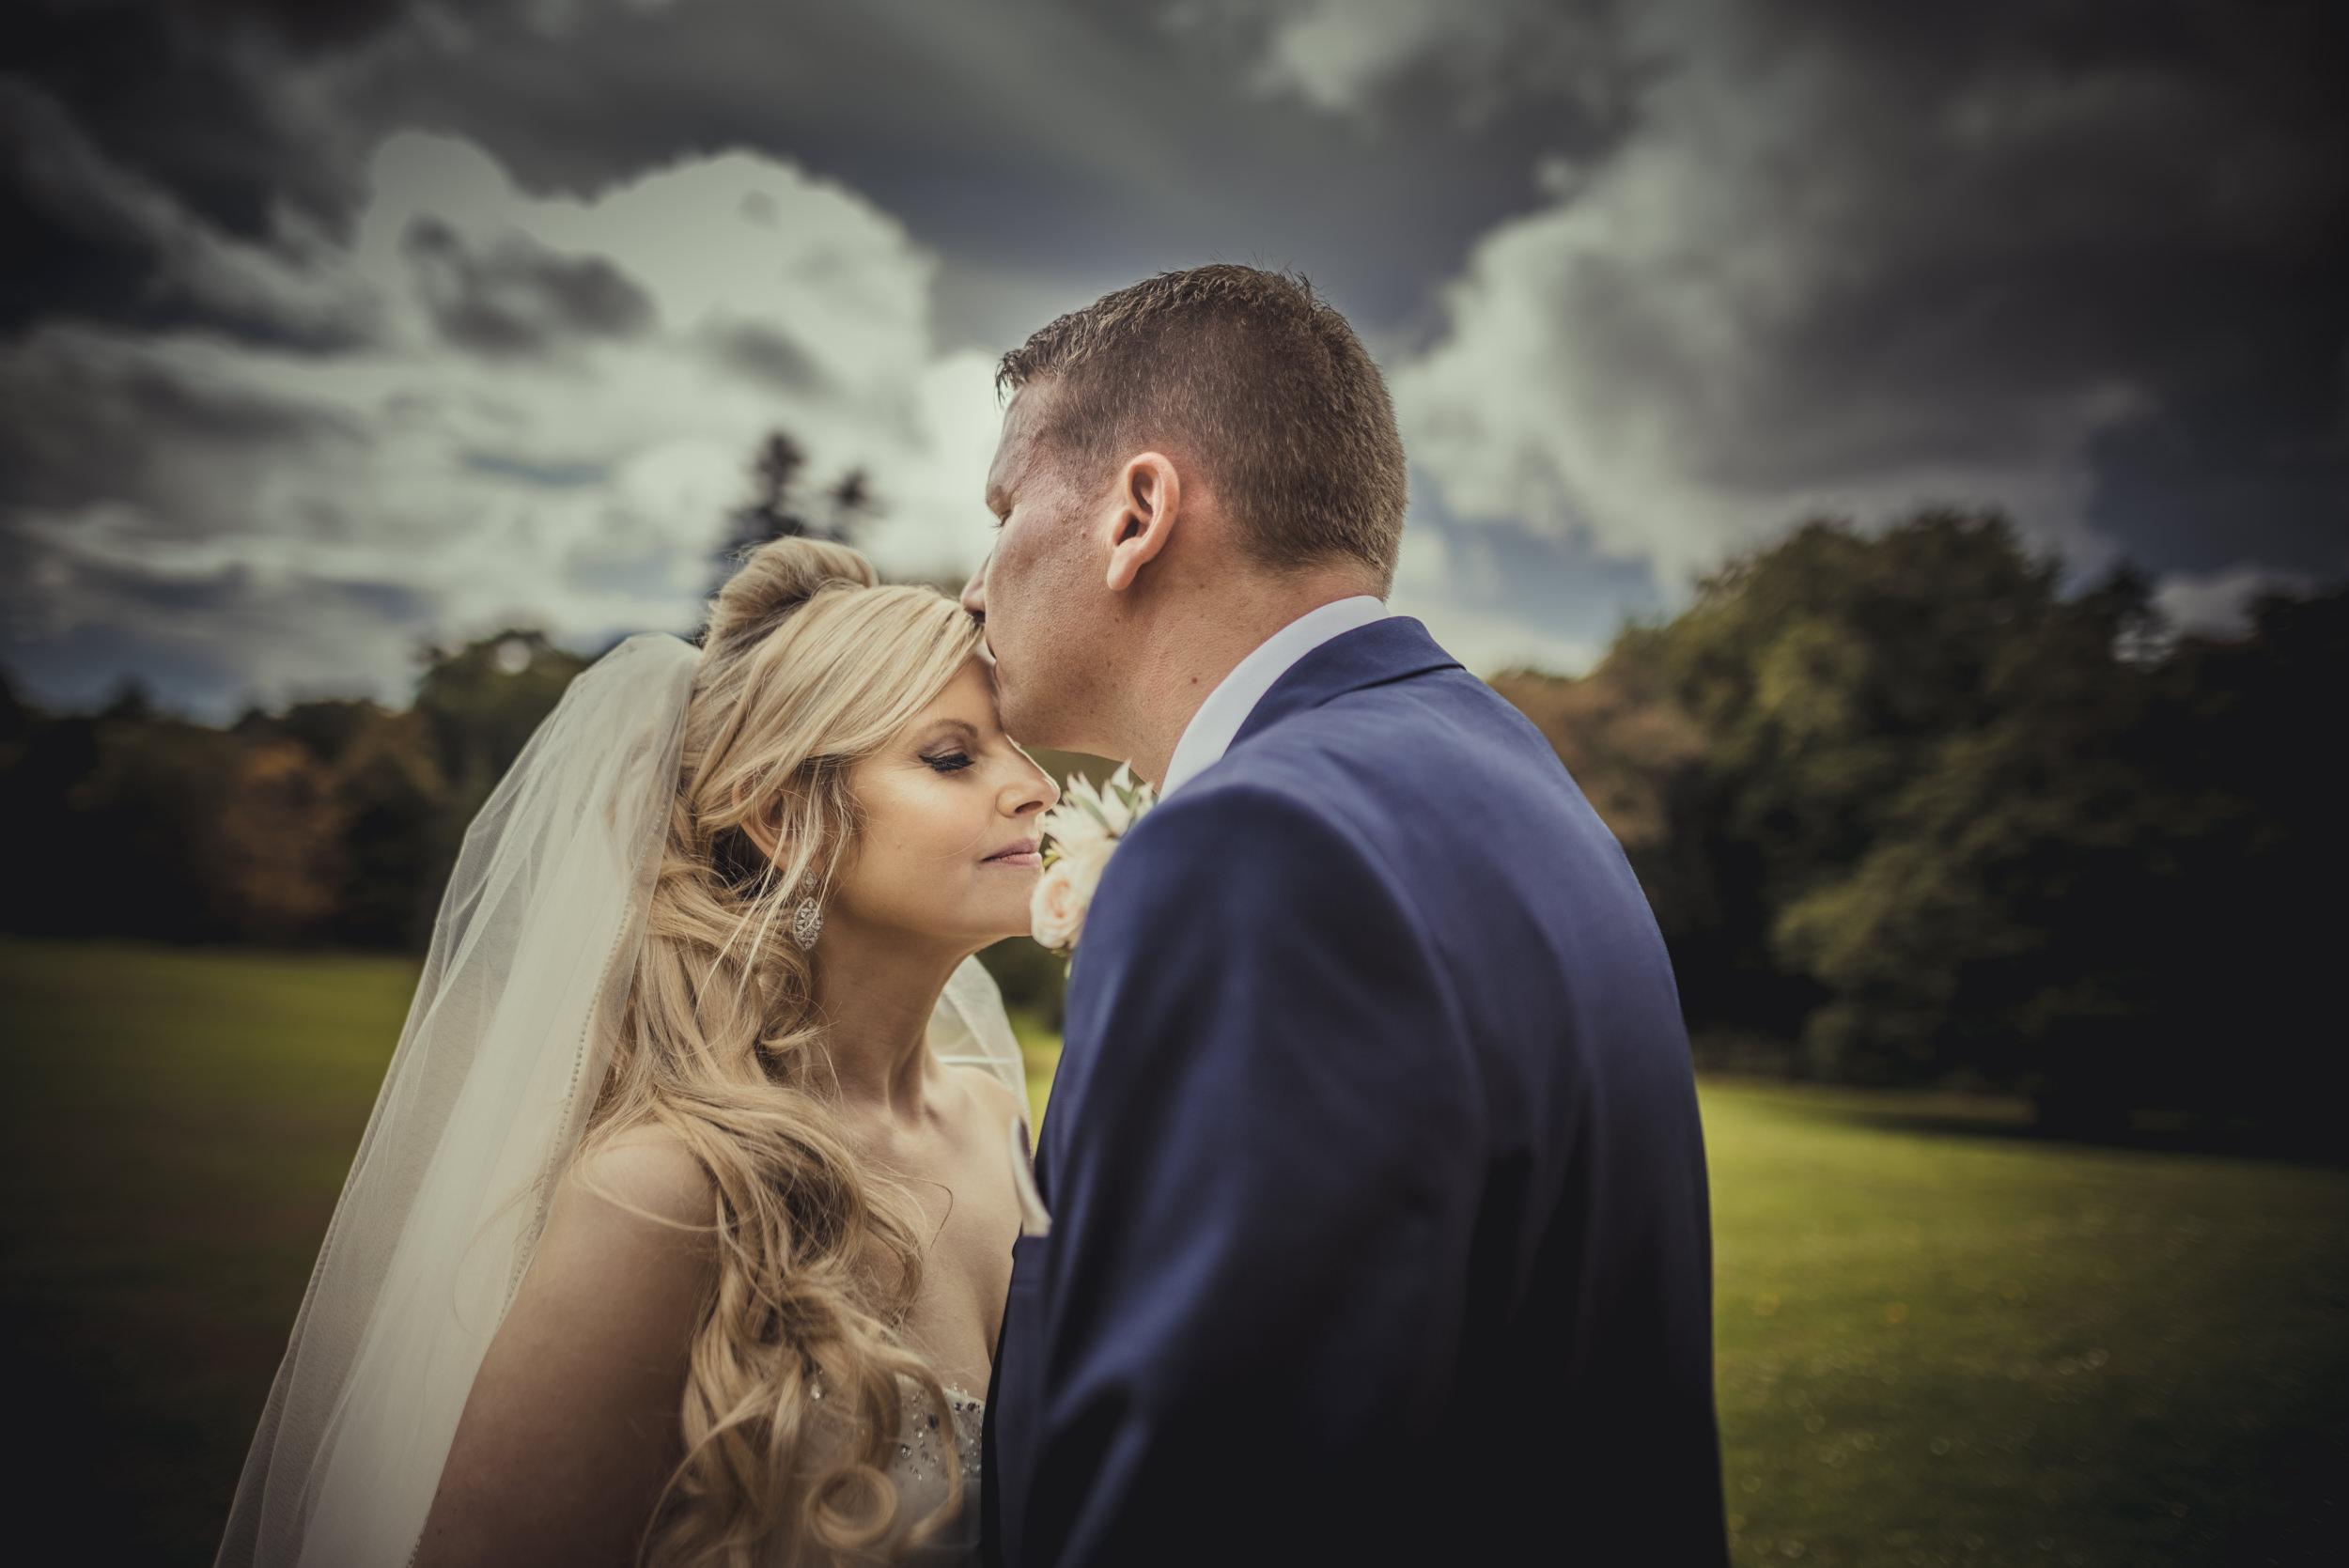 Trisha-and-Roger-wedding-The-Priory-Church-and-Chewton-Glen-Hotel-Christchurch-Manu-Mendoza-Wedding-Photography-549.jpg